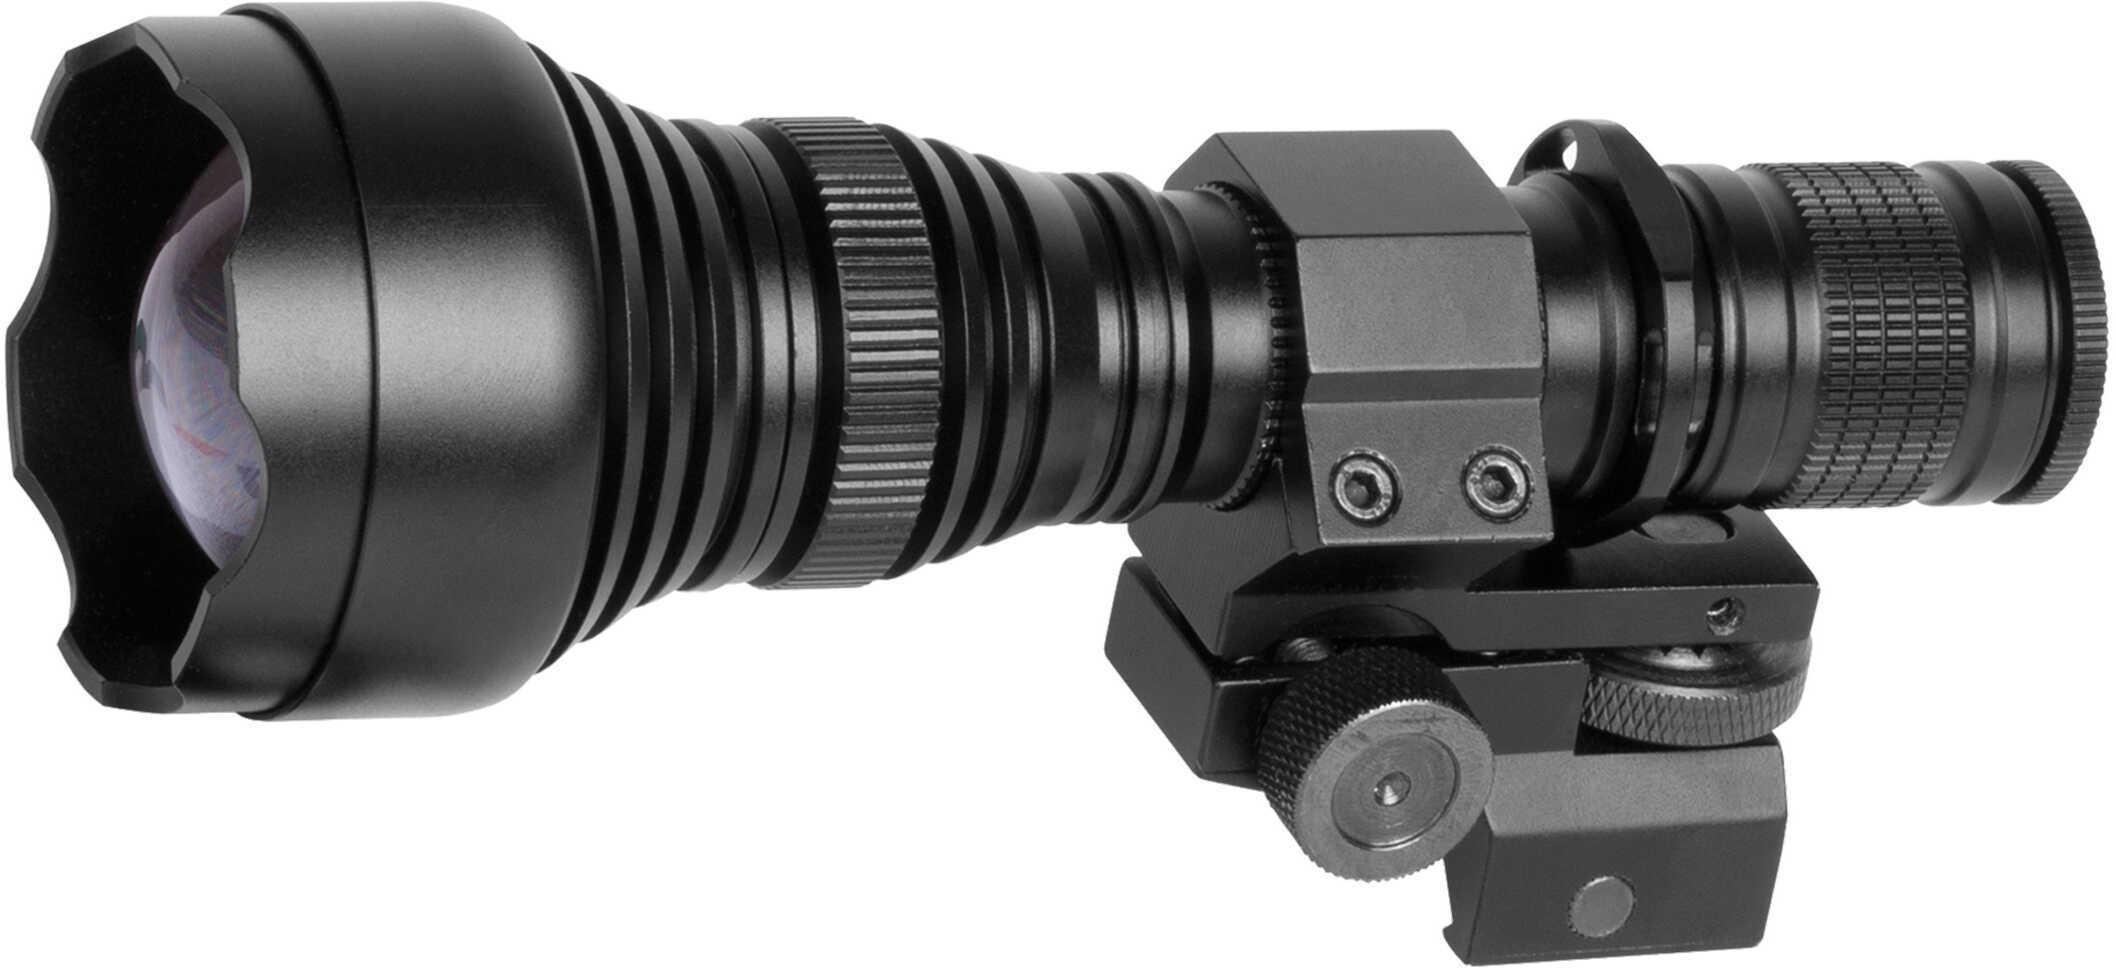 ATN IR850-Pro Long Range IR Illuminator Adjustable Mount